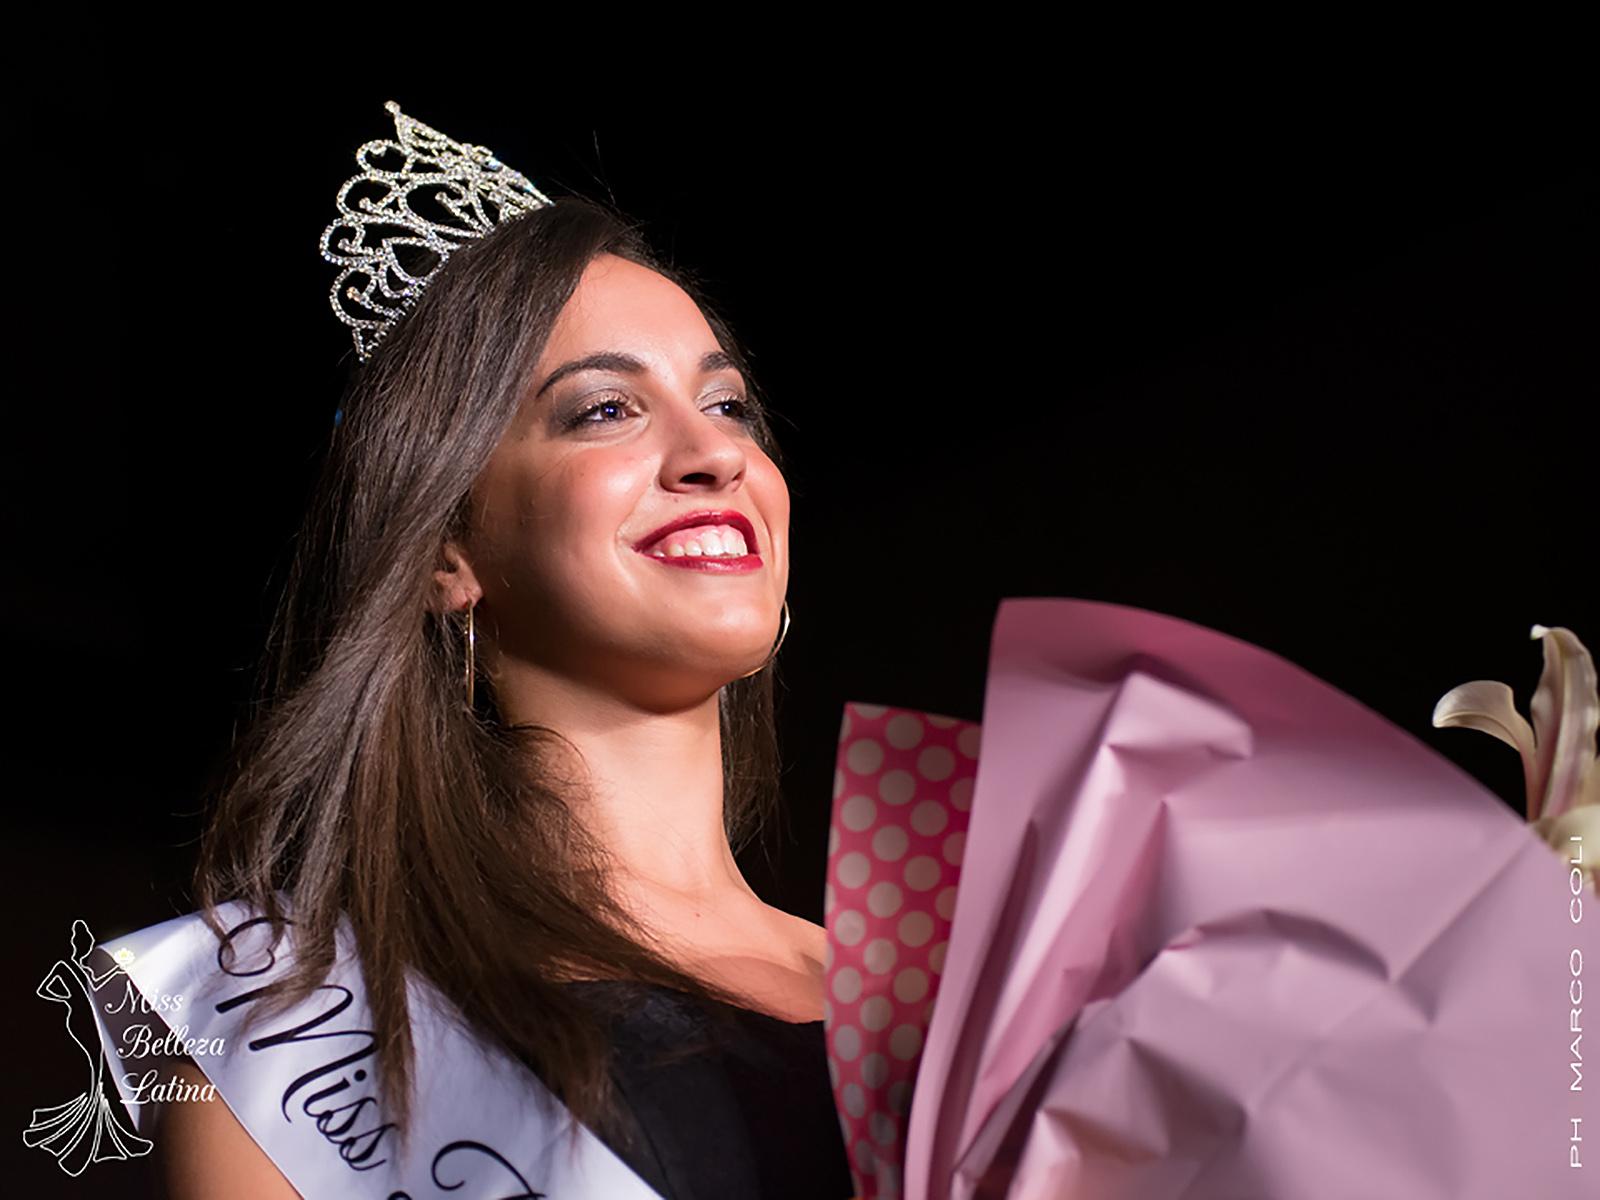 Incoronata Miss Belleza Latina in Italia: La Brasiliana Kay Grelli